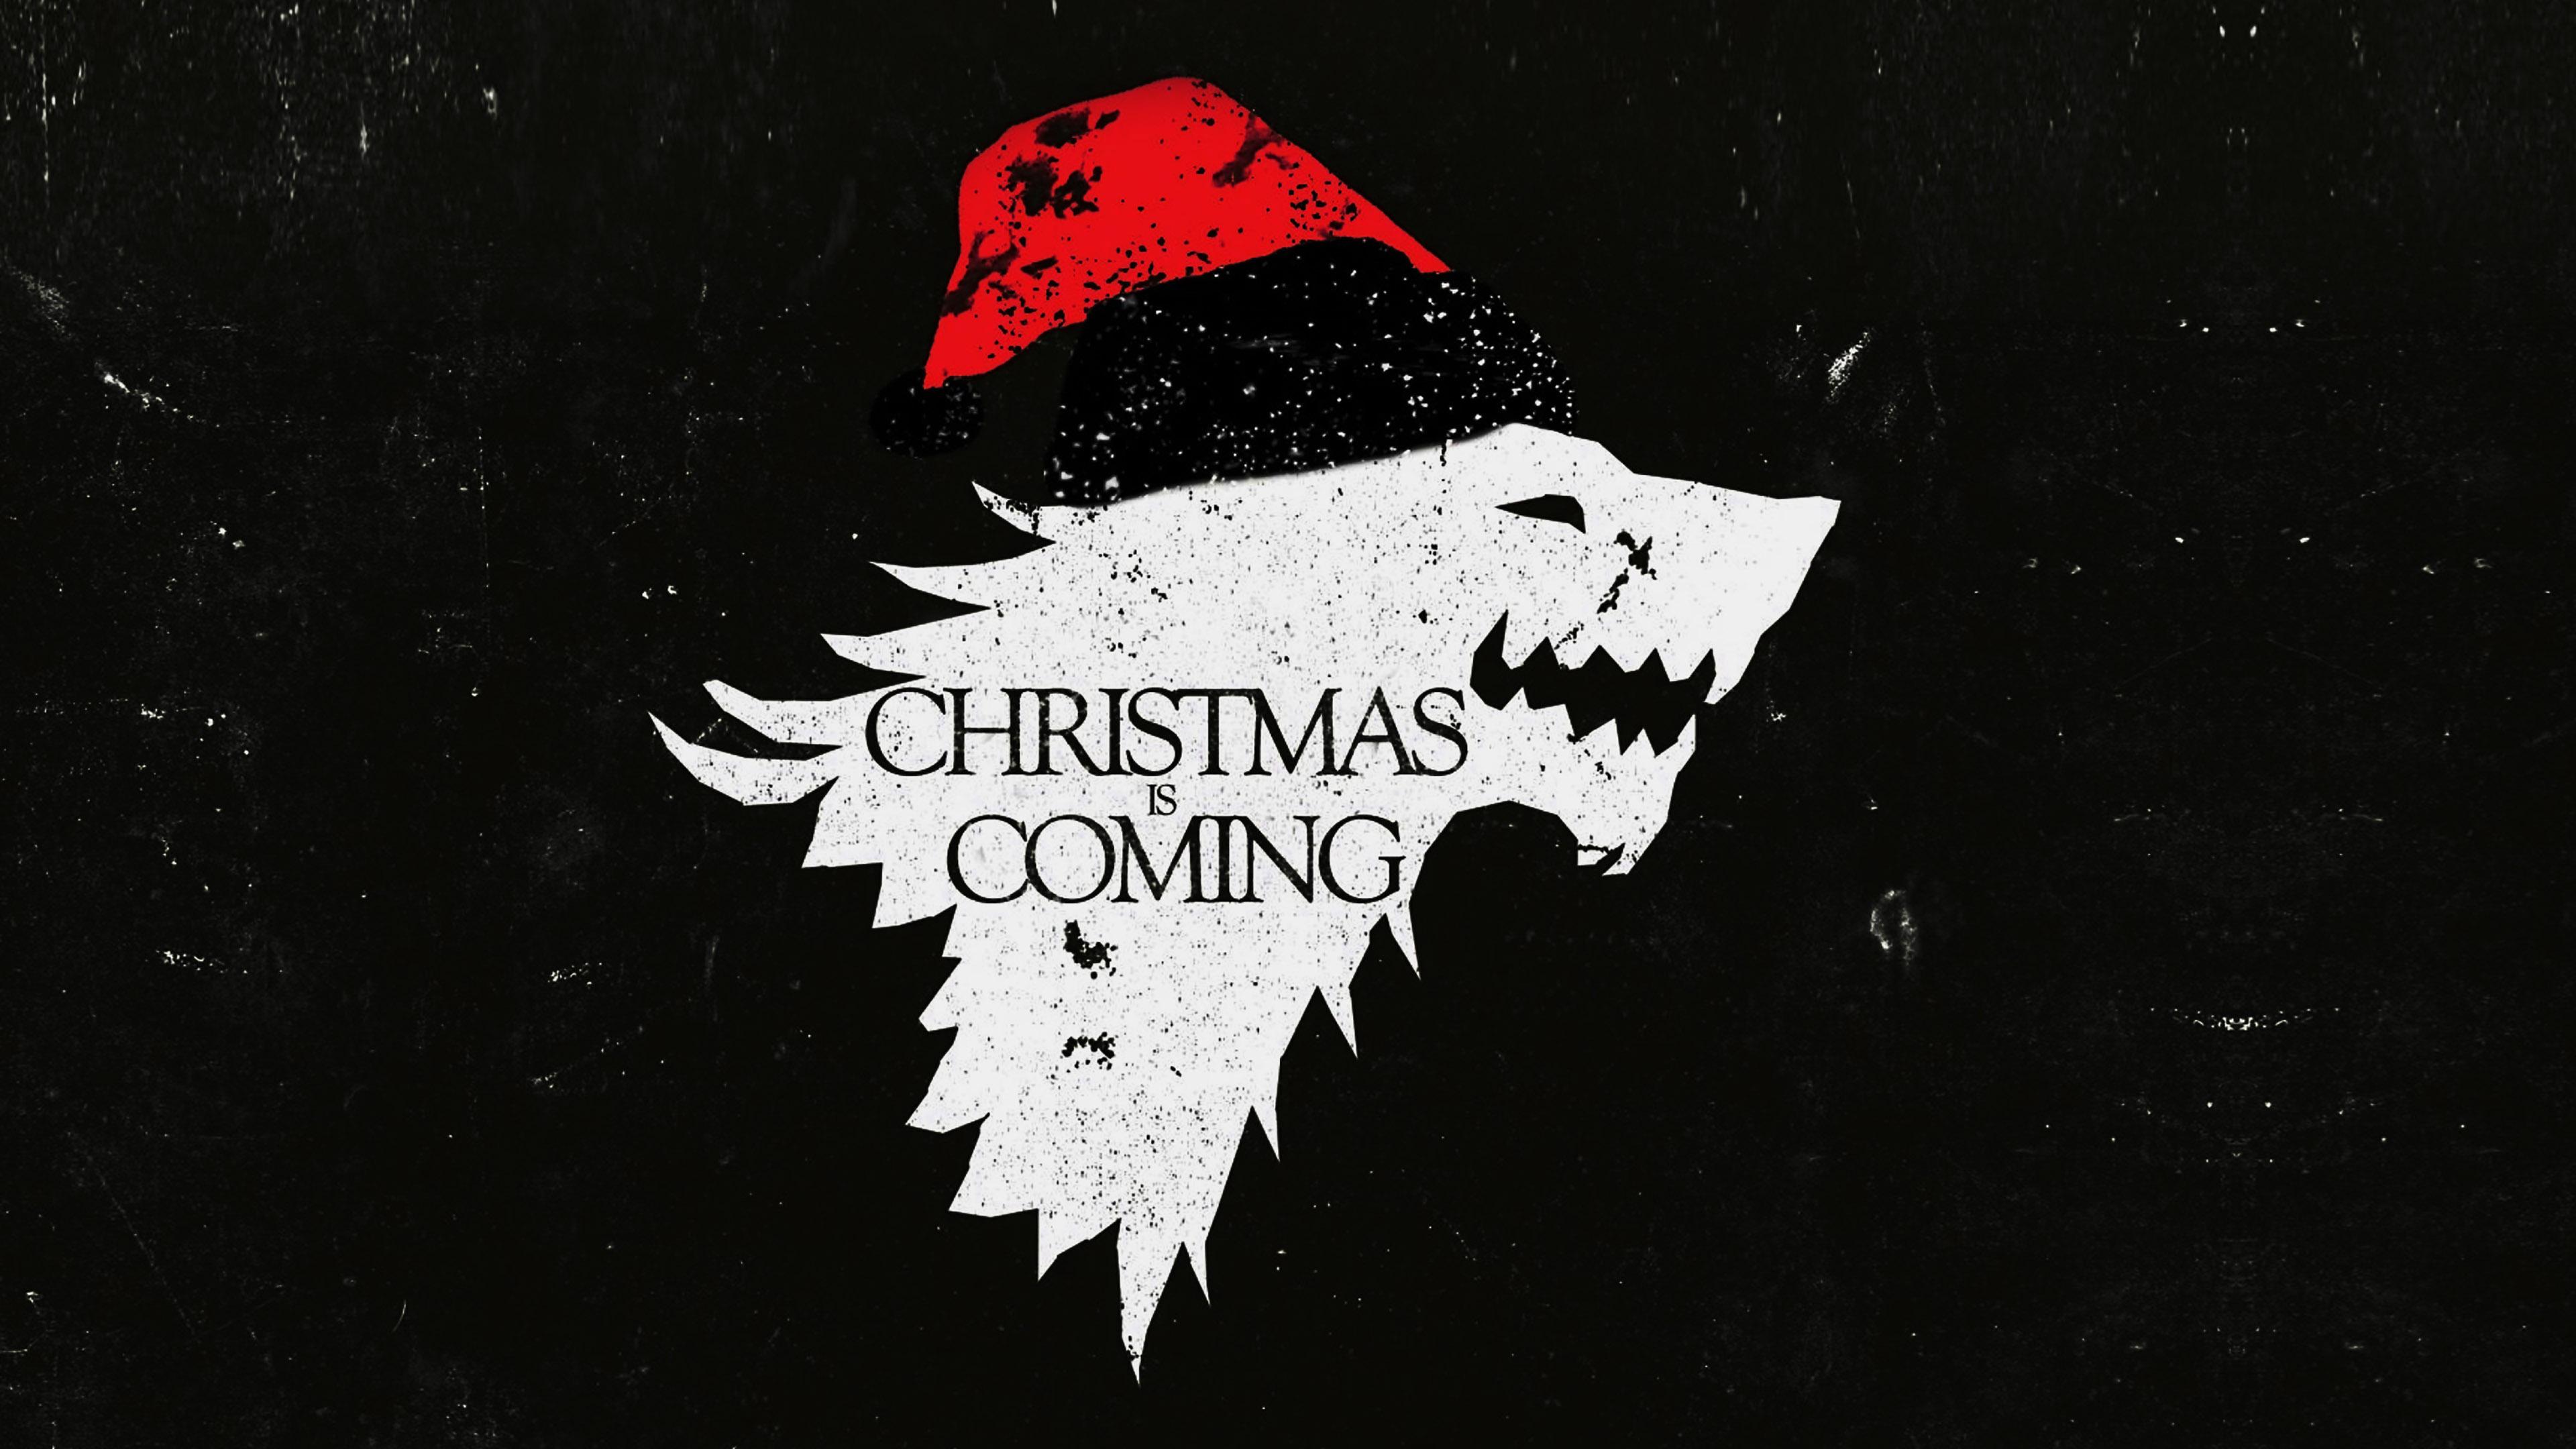 Rainbow Wallpaper Iphone X Ag24 Christmas Is Coming Dark Game Of Thrones Art Wallpaper